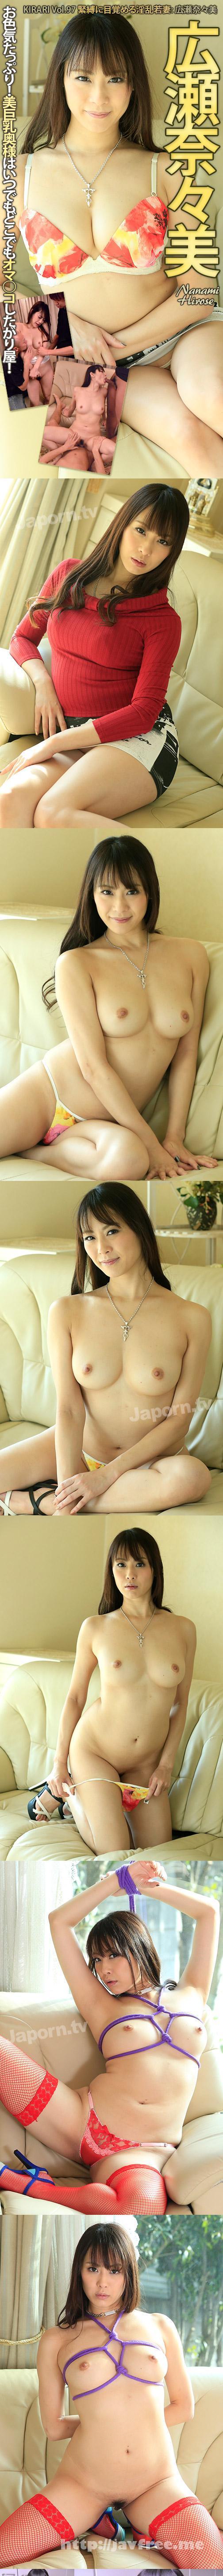 [MKD S97] KIRARI 97 緊縛に目覚める淫乱若妻 : 広瀬奈々美 広瀬奈々美 Nanami Hirose MKD